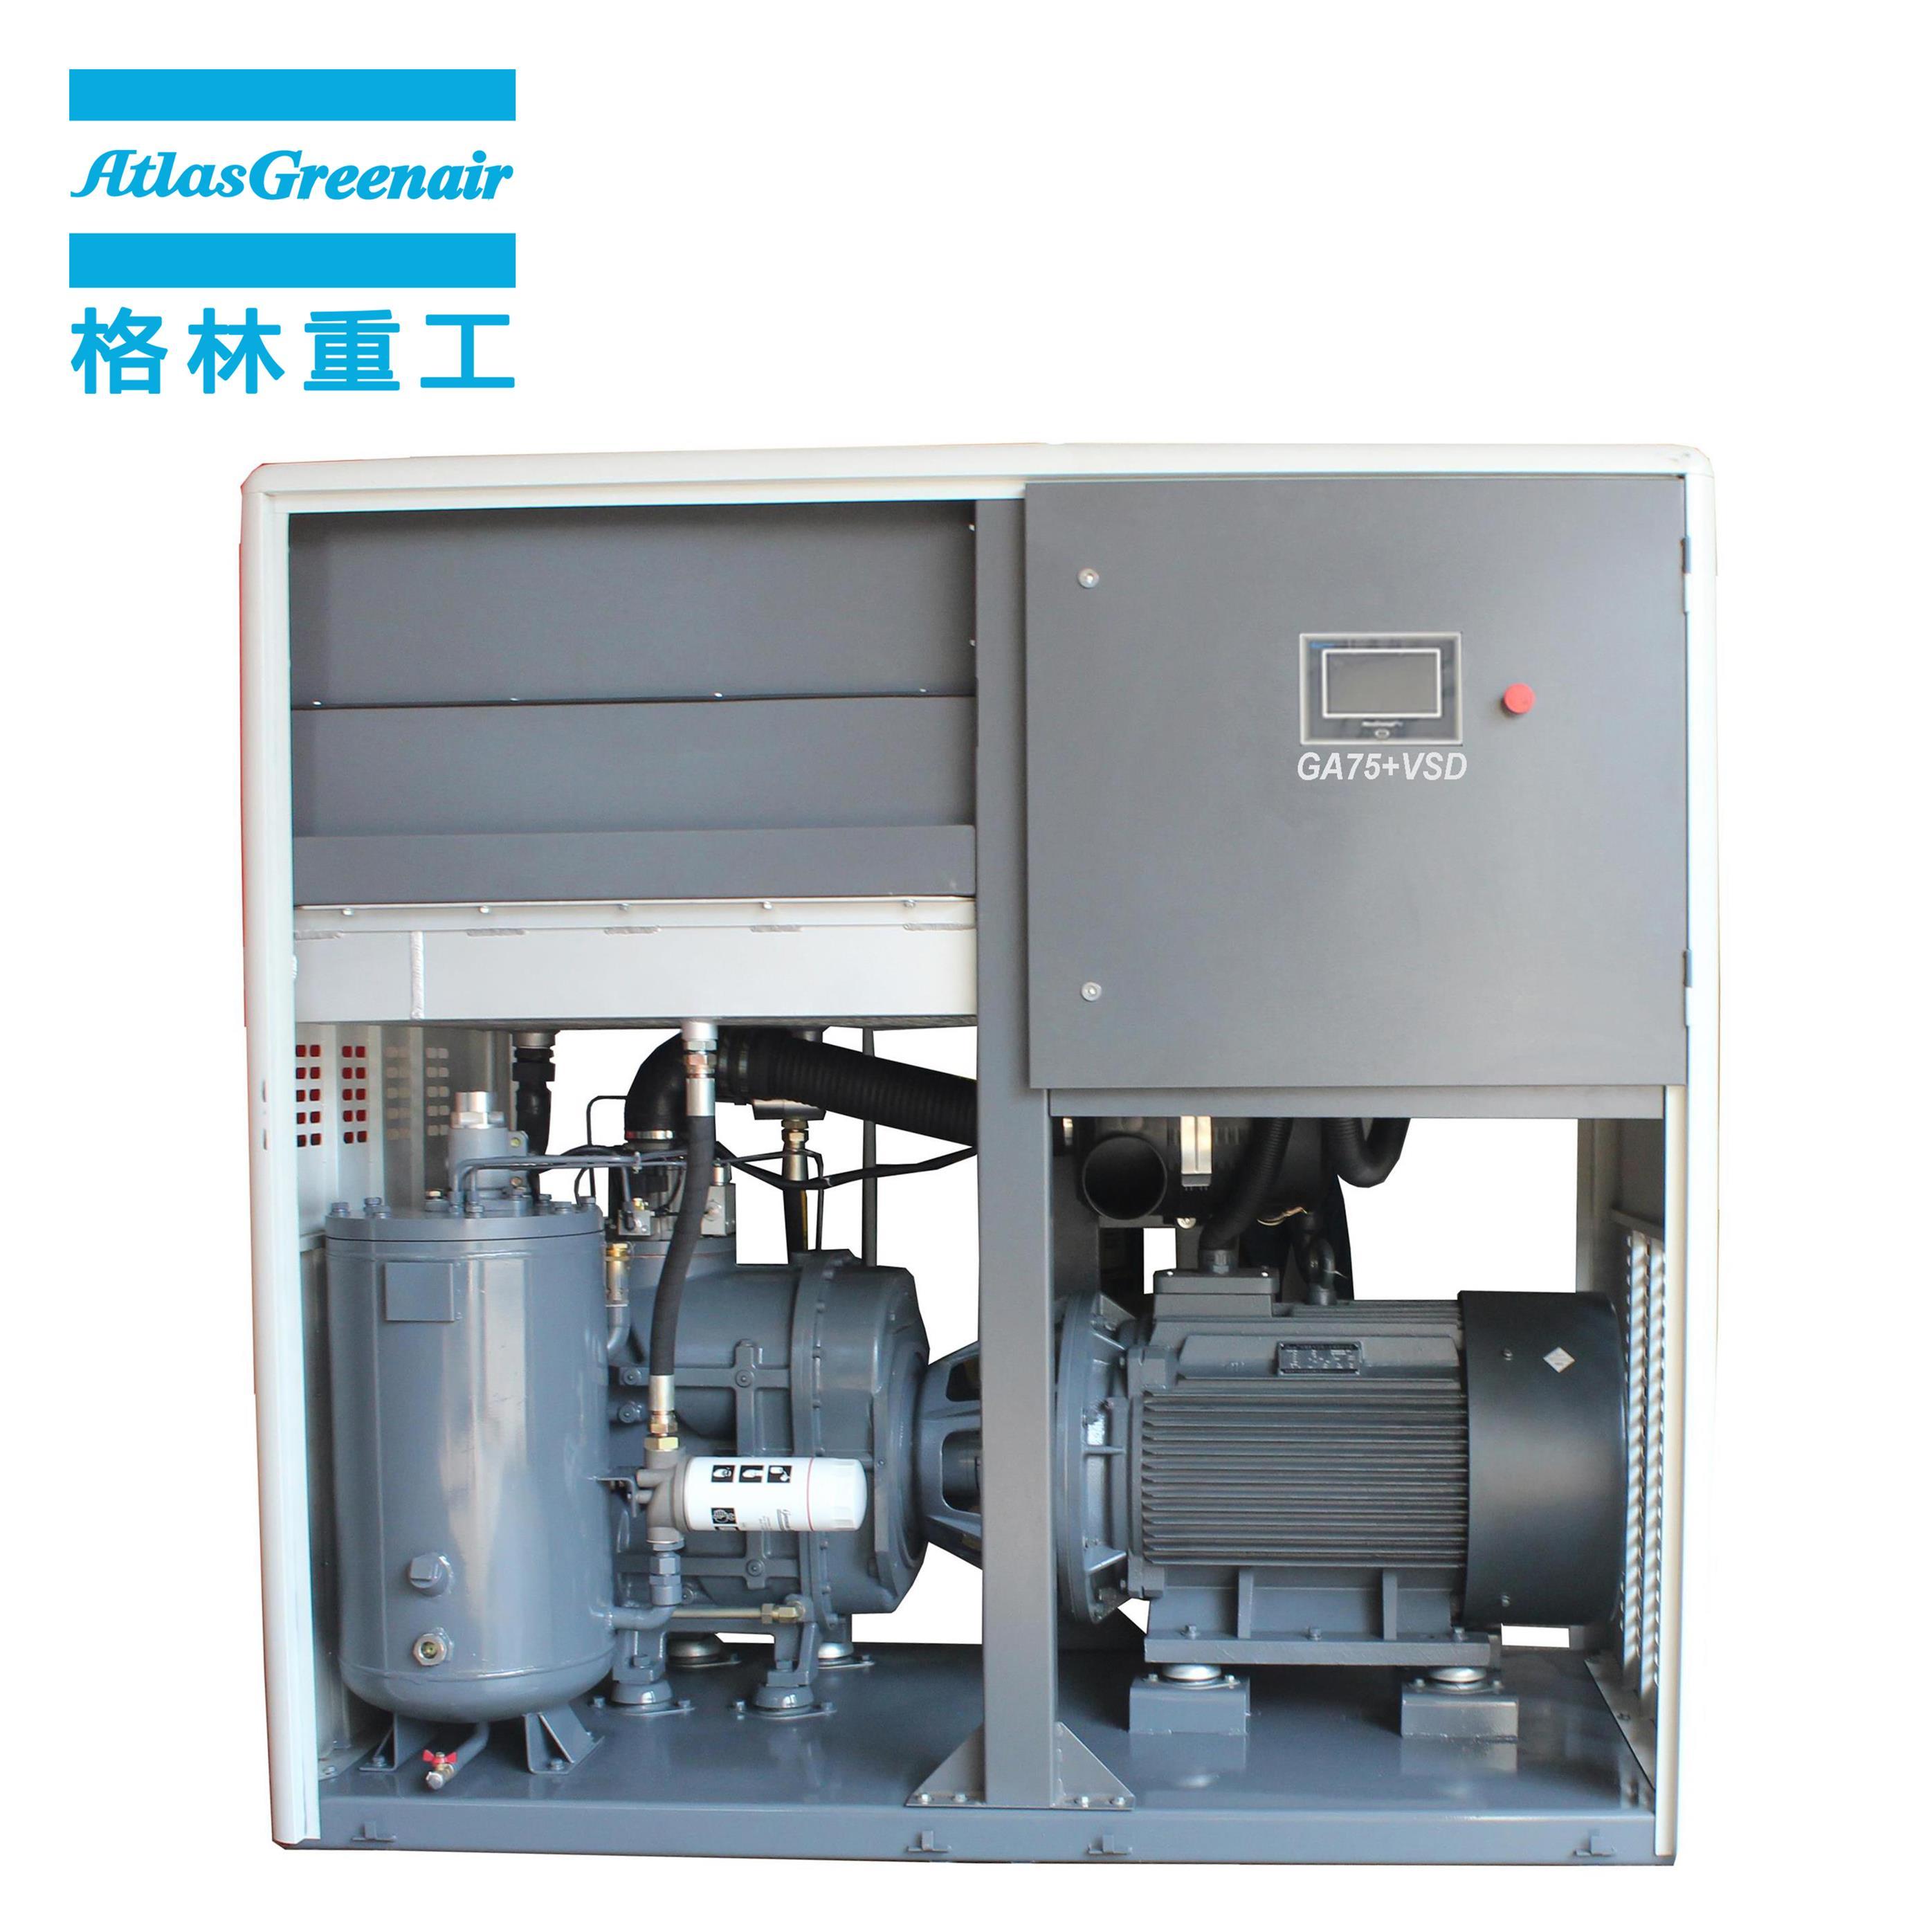 Atlas Greenair Screw Air Compressor vsd compressor atlas copco supplier for tropical area-2